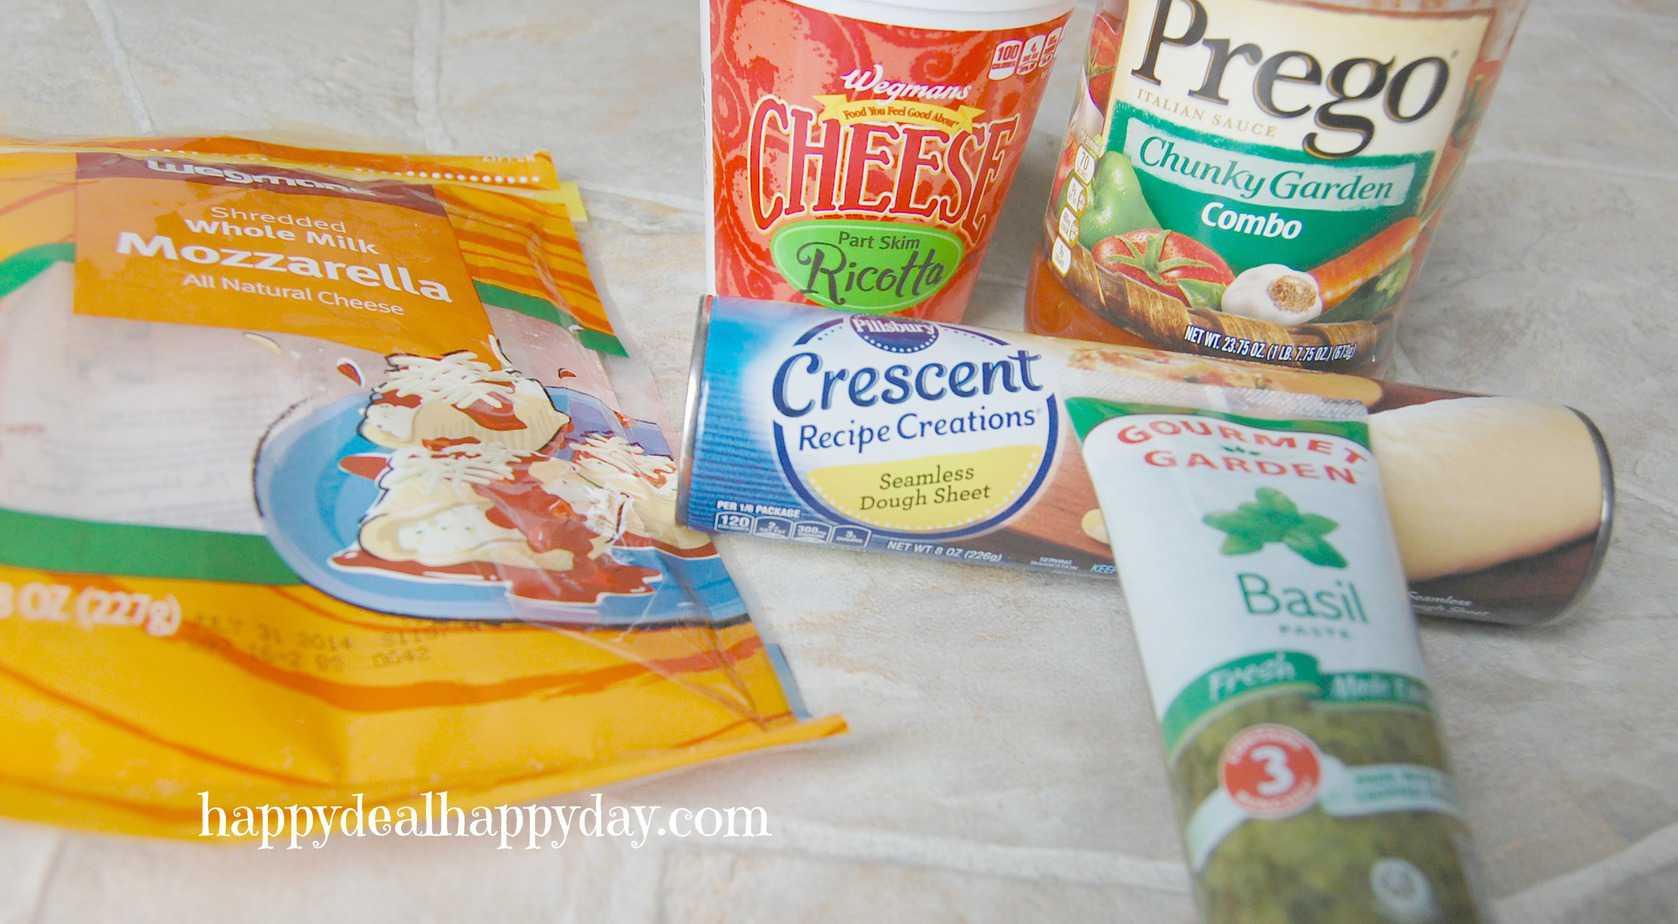 calzone ingredients